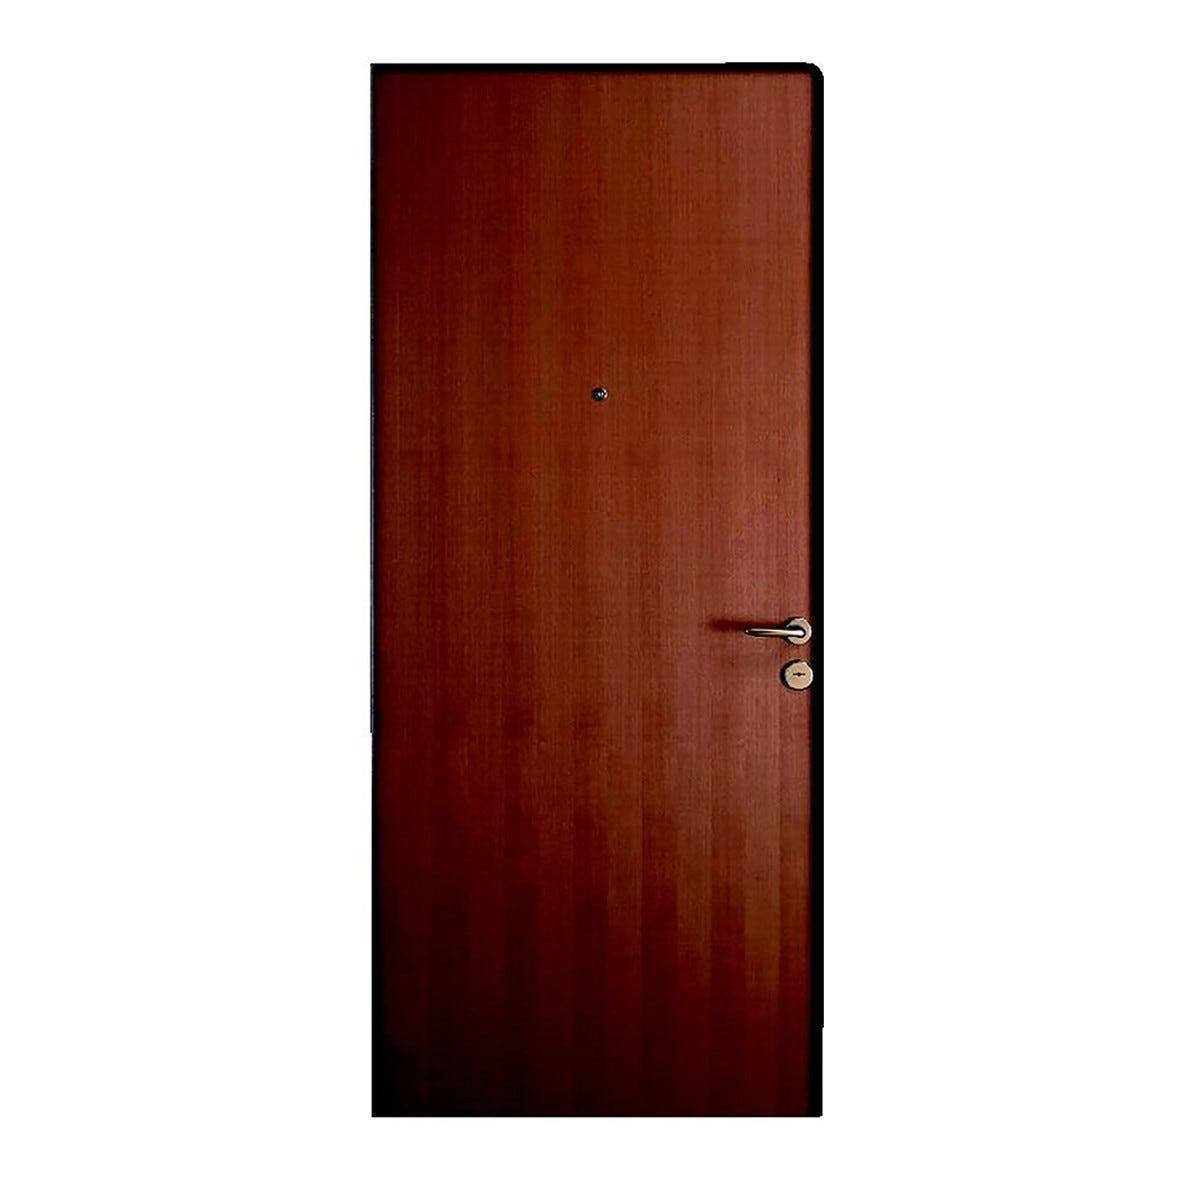 Porta Blindata Steel Apertura Spinta A Sinistra 210x80 Cm (Hxl)